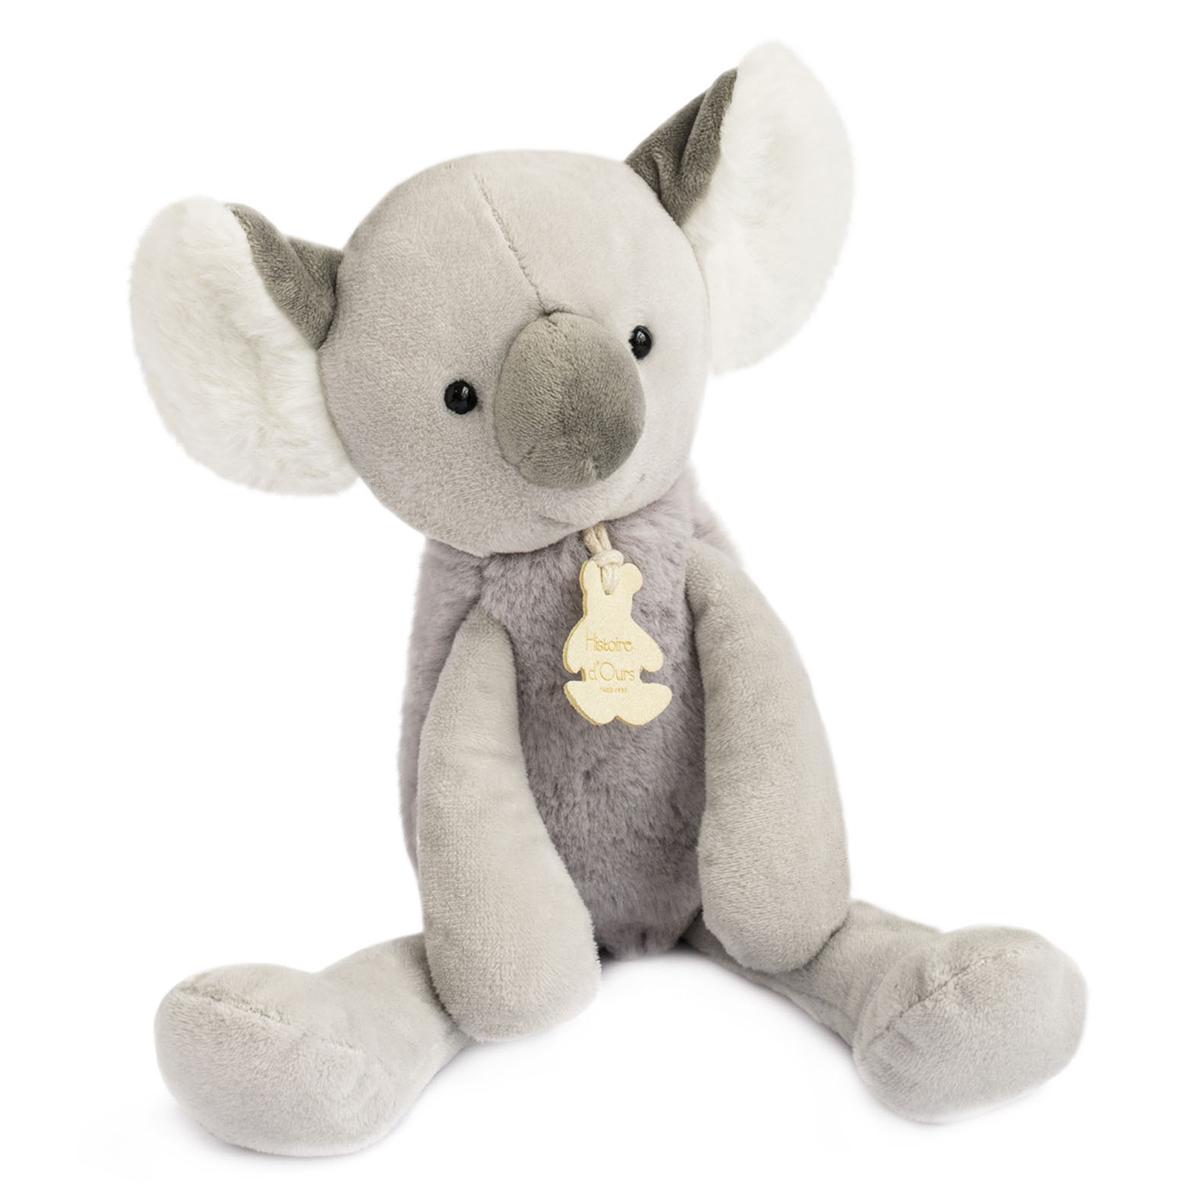 Peluche Peluche Sweety Chou Koala - Moyen Peluche Sweety Chou Koala 30 cm